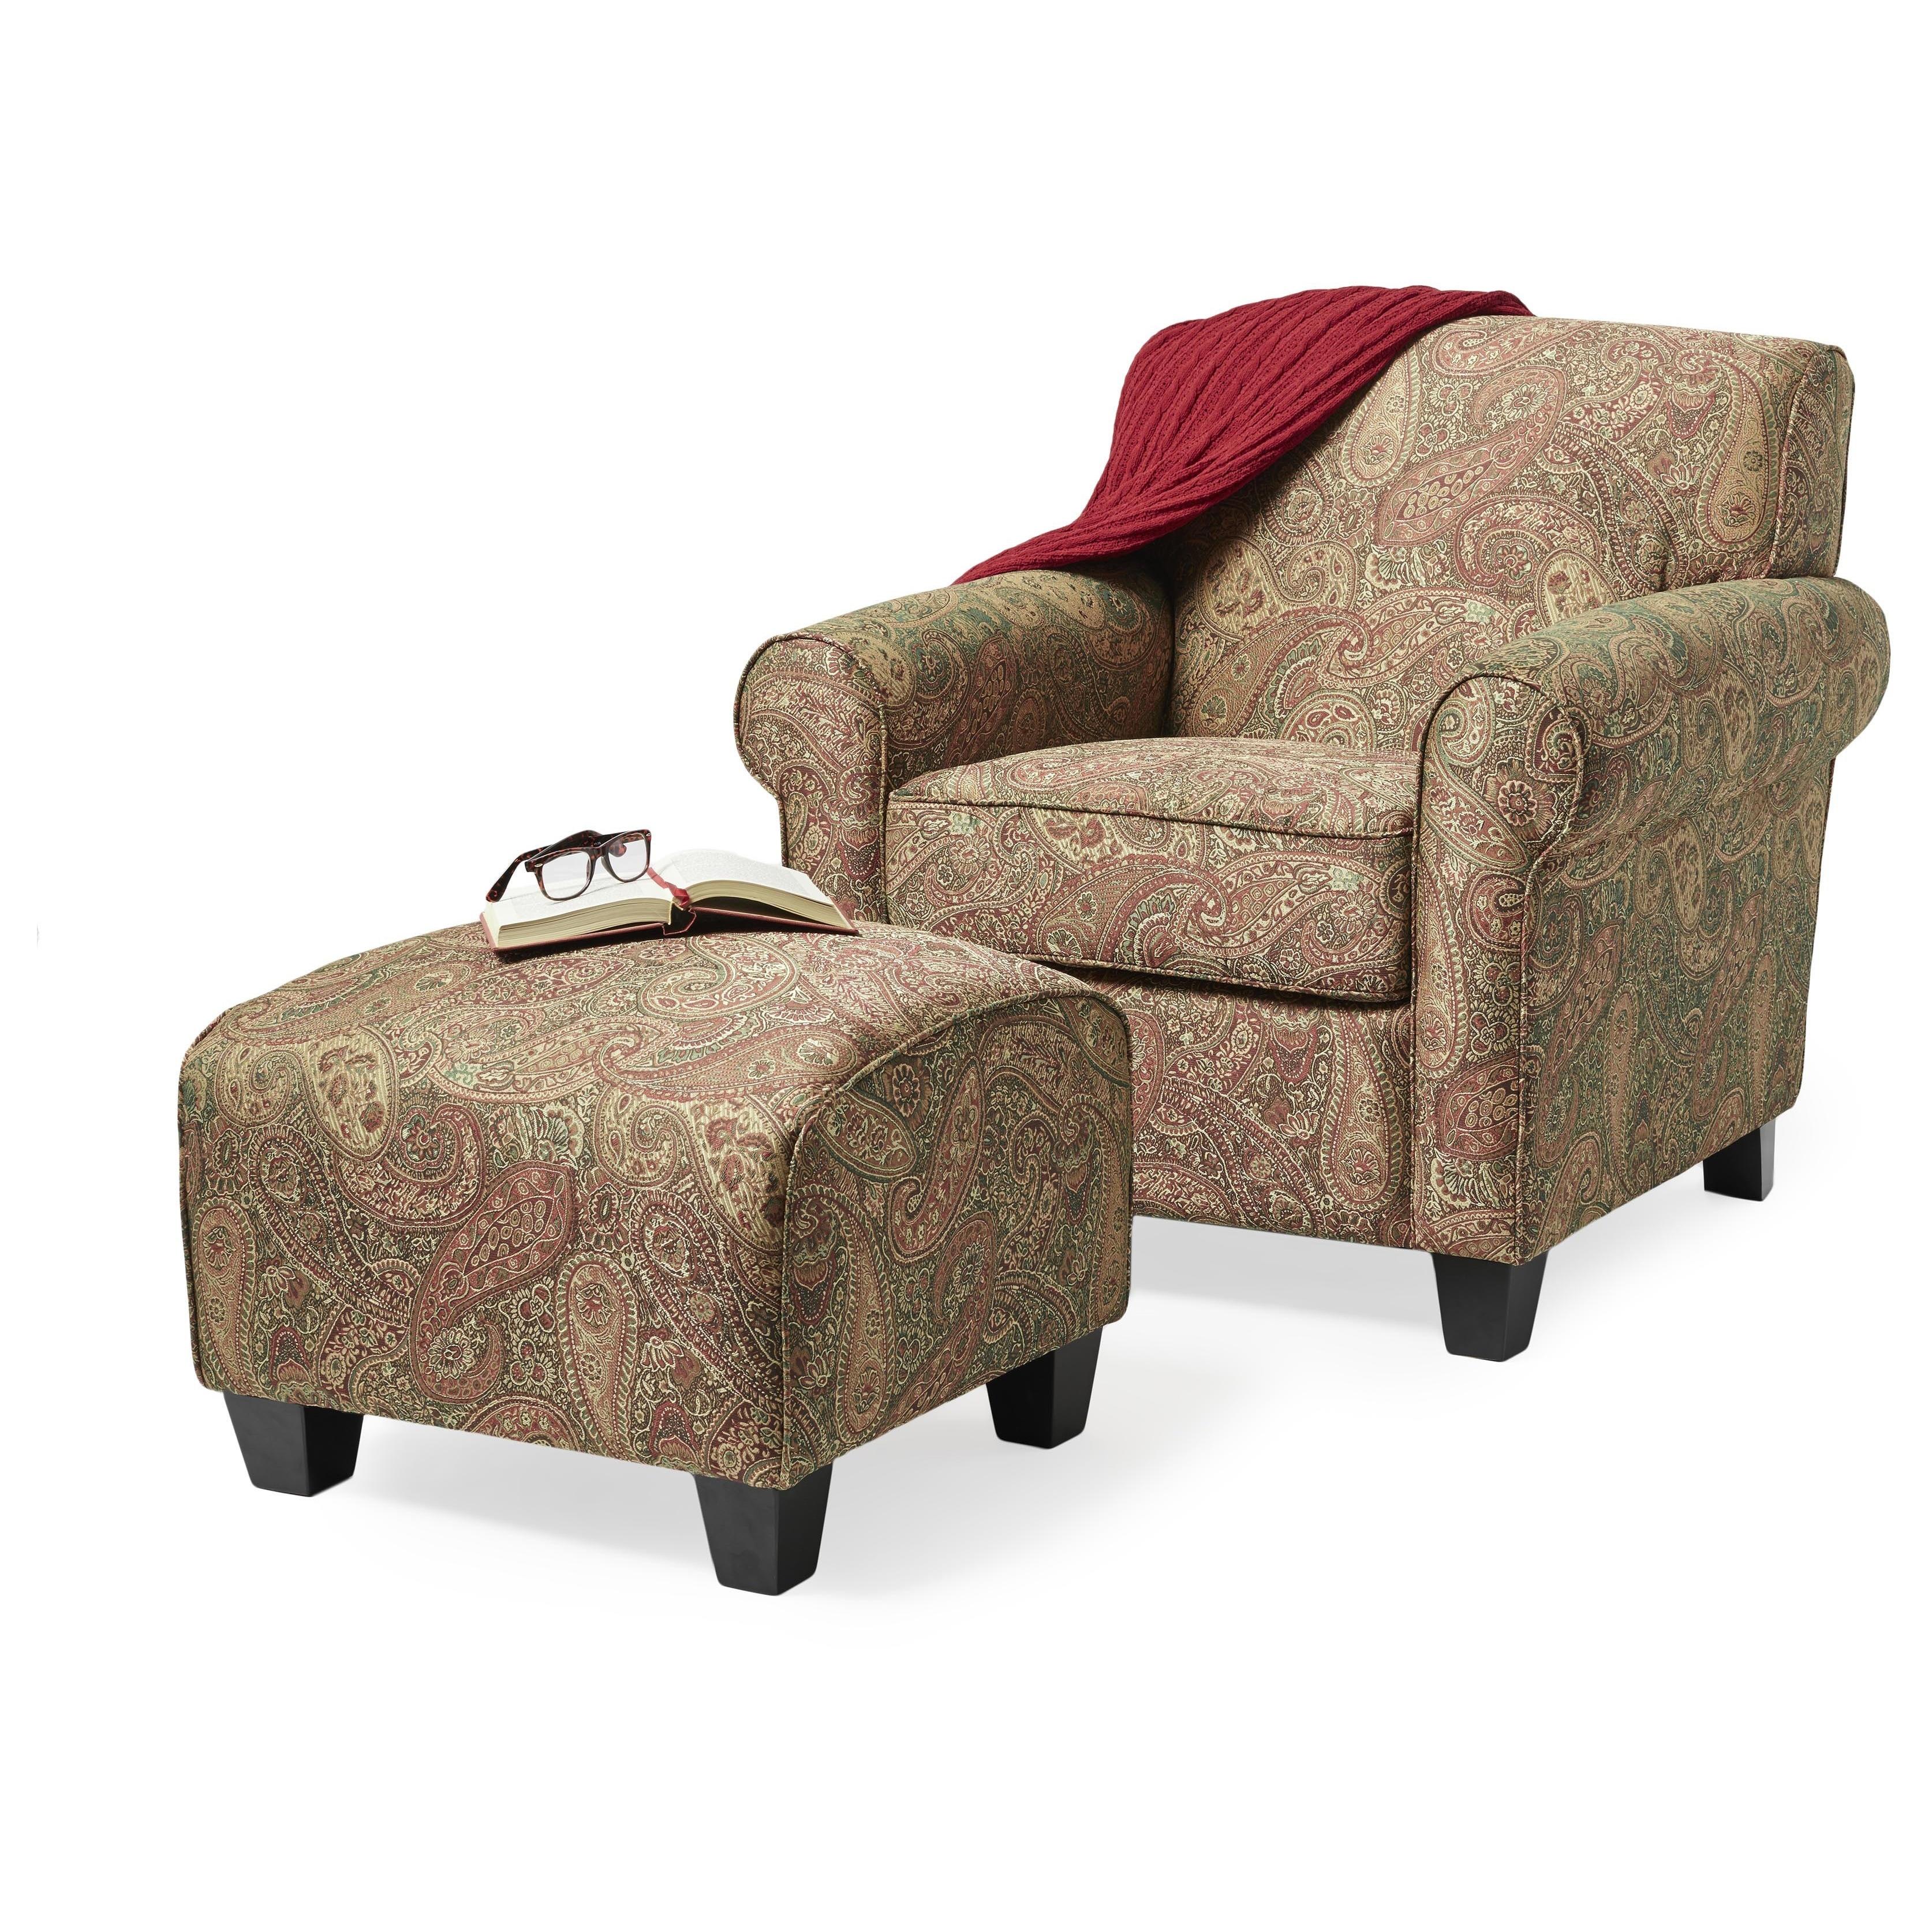 Portfolio Mira 8 way Hand tied Paisley Arm Chair and Ottoman